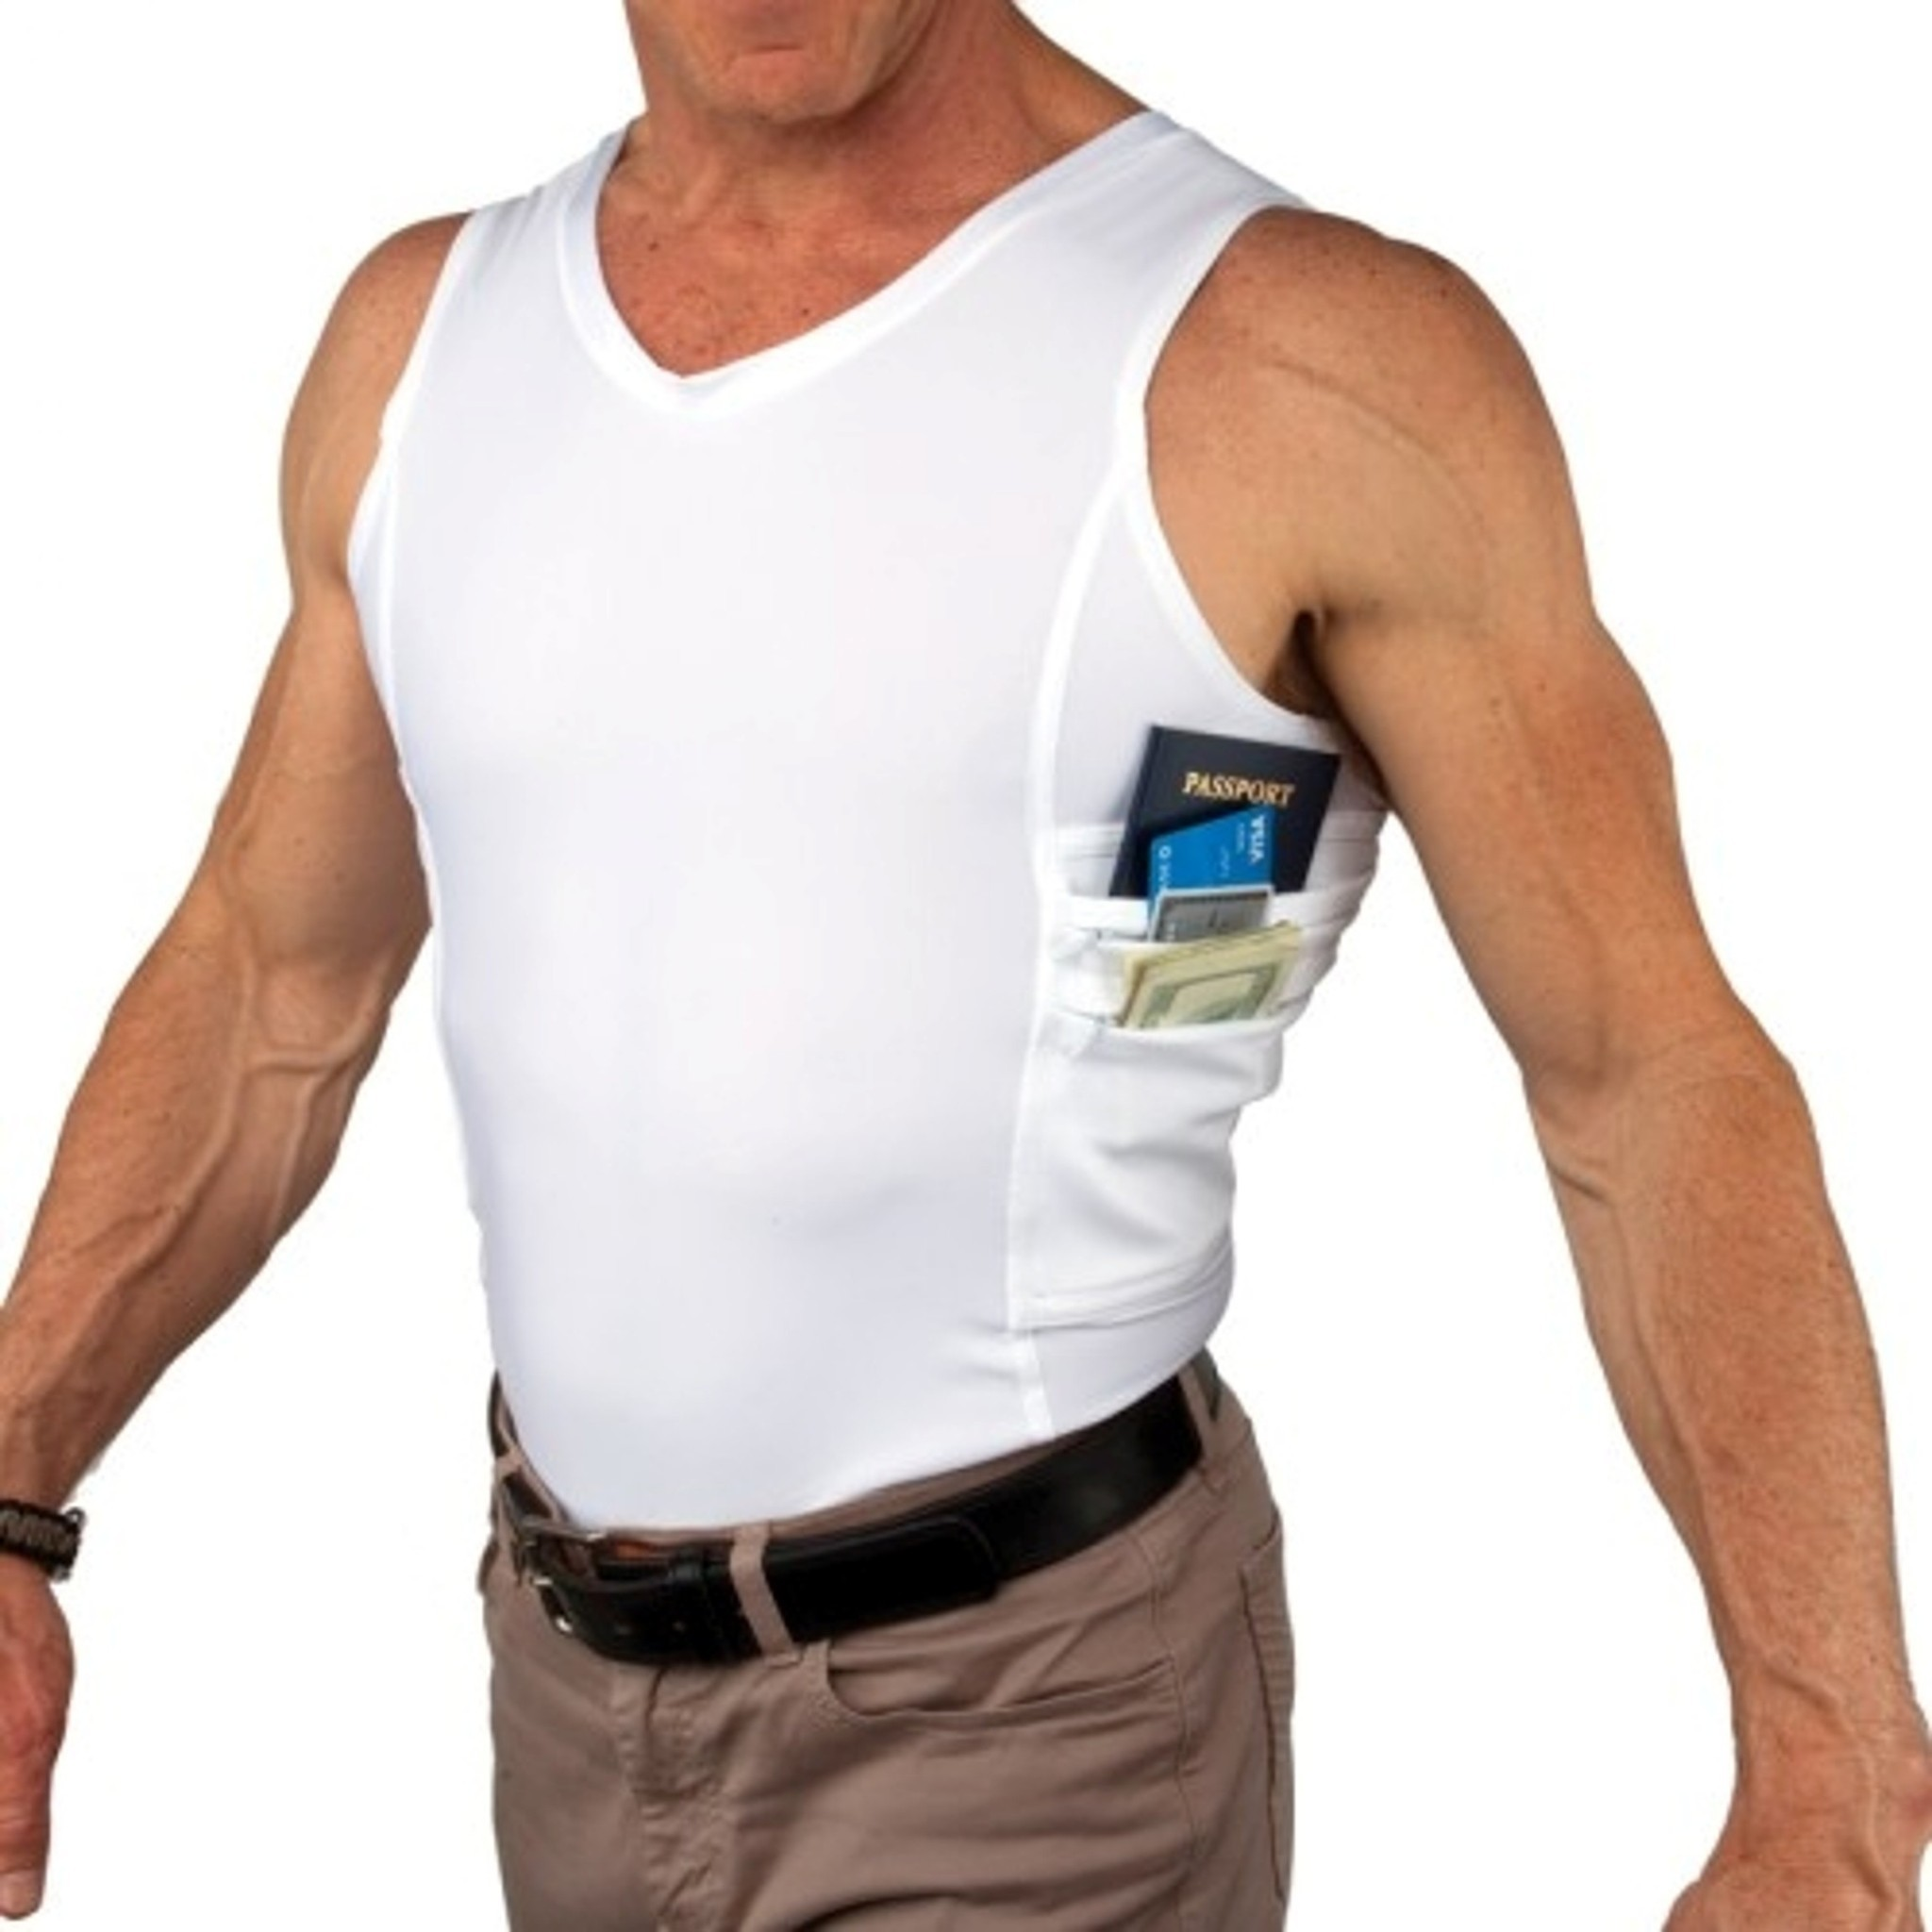 gear undershirts with hidden pockets la times